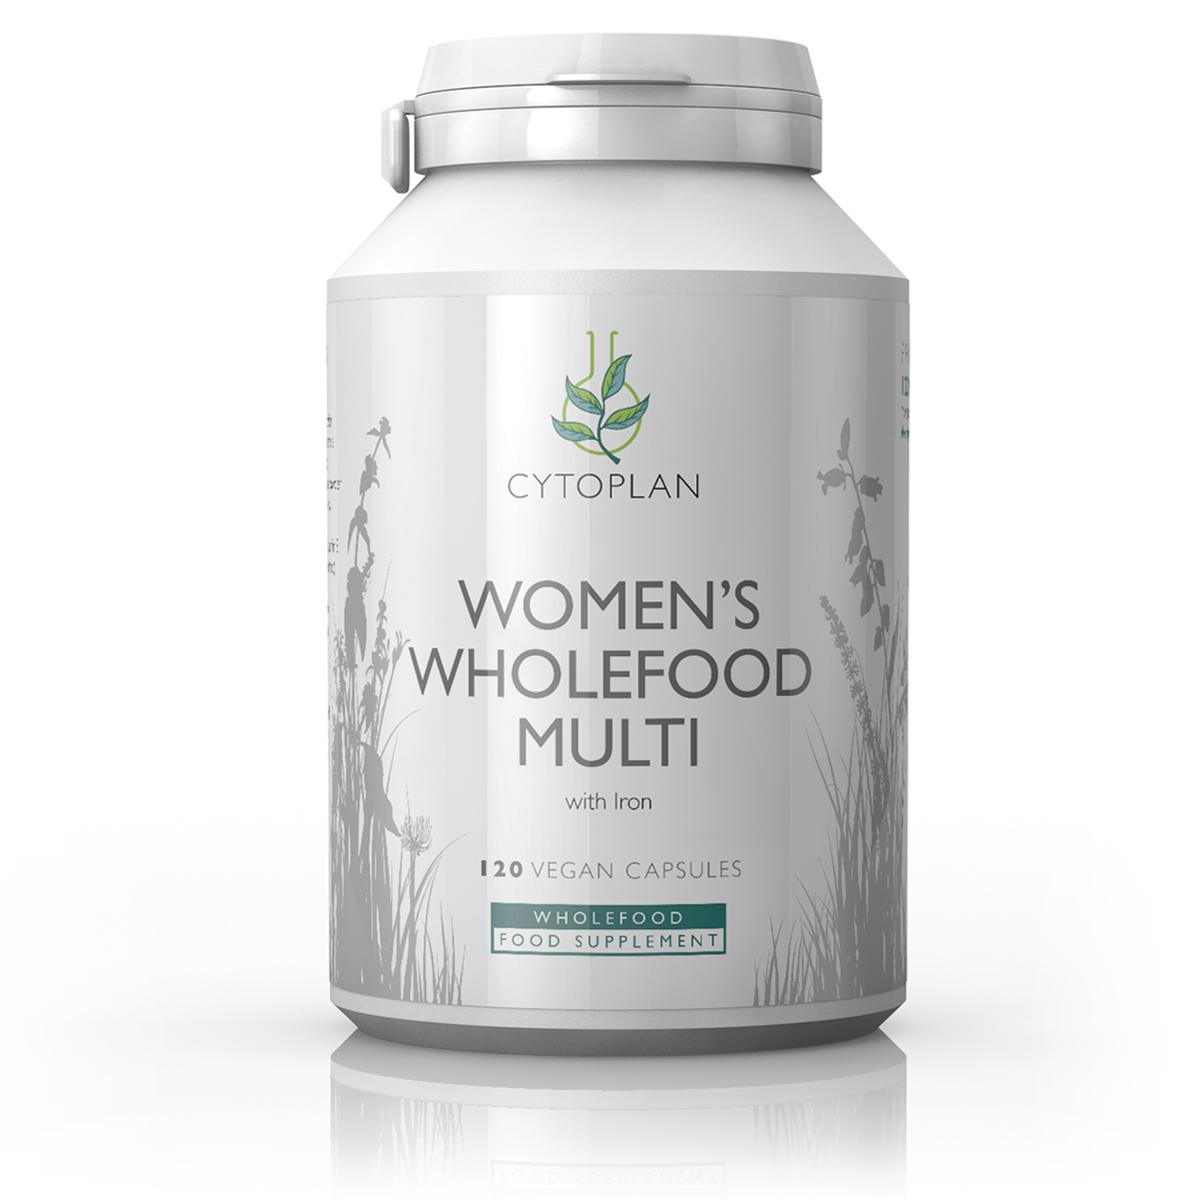 Women's Wholefood Multi 120's